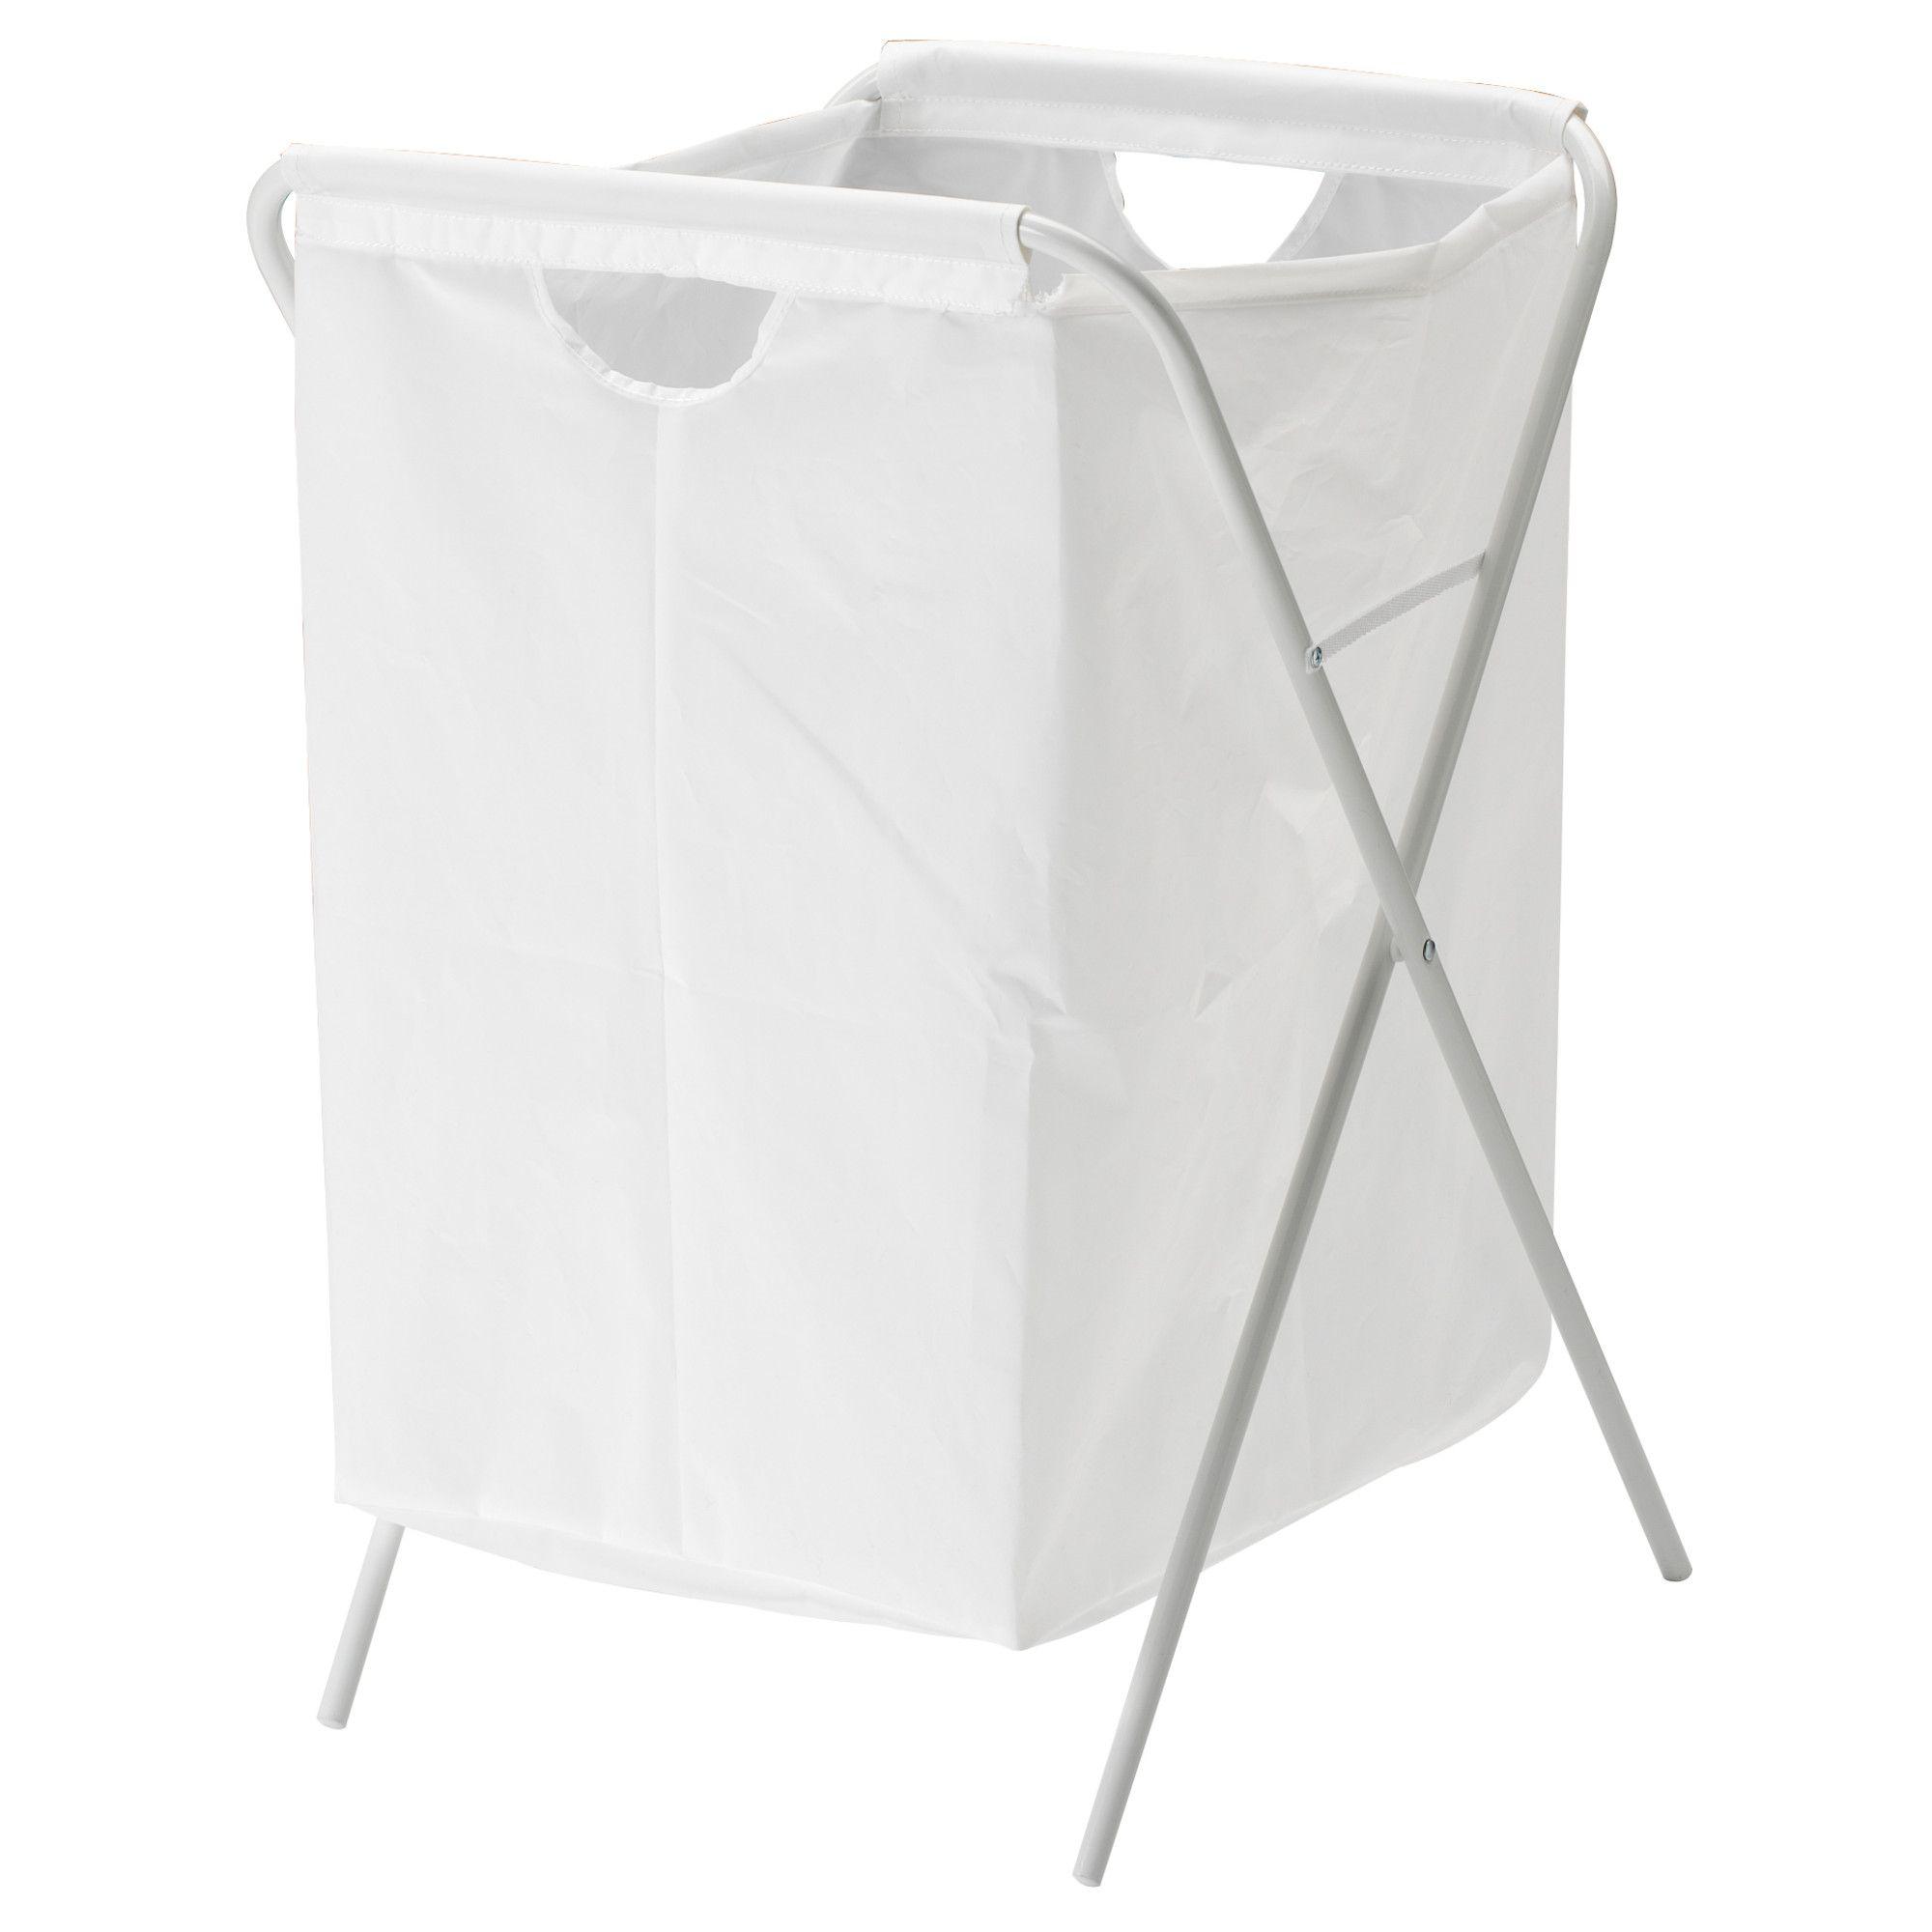 Ikea Jall White Laundry Bag With Stand Ikea Laundry Basket Ikea